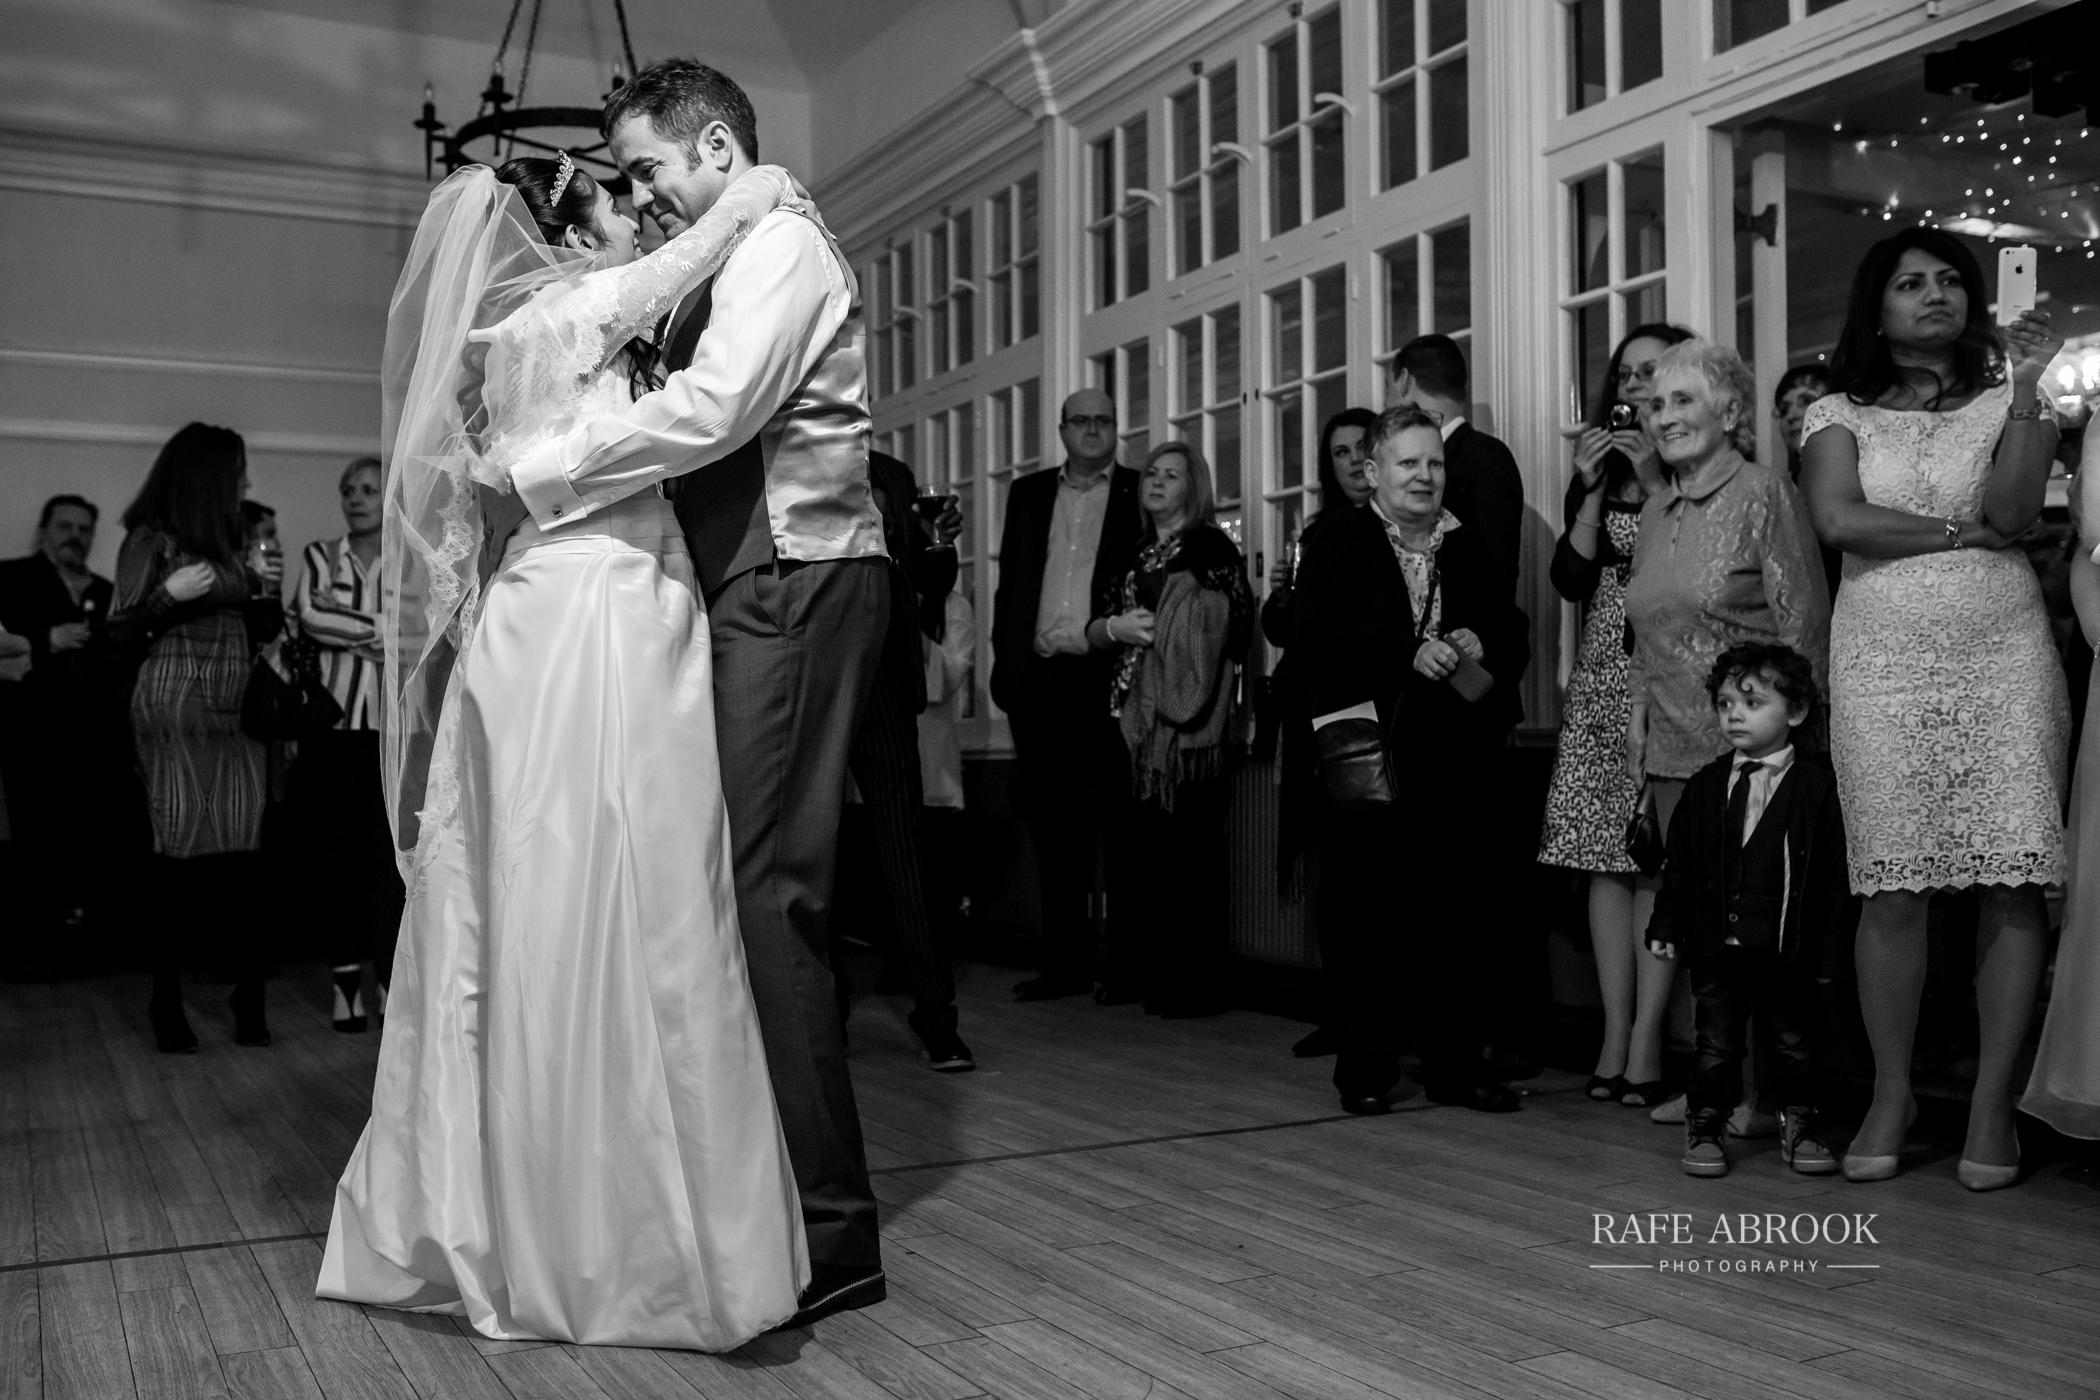 roma & pete wedding hampstead shenley hertfordshire -488.jpg